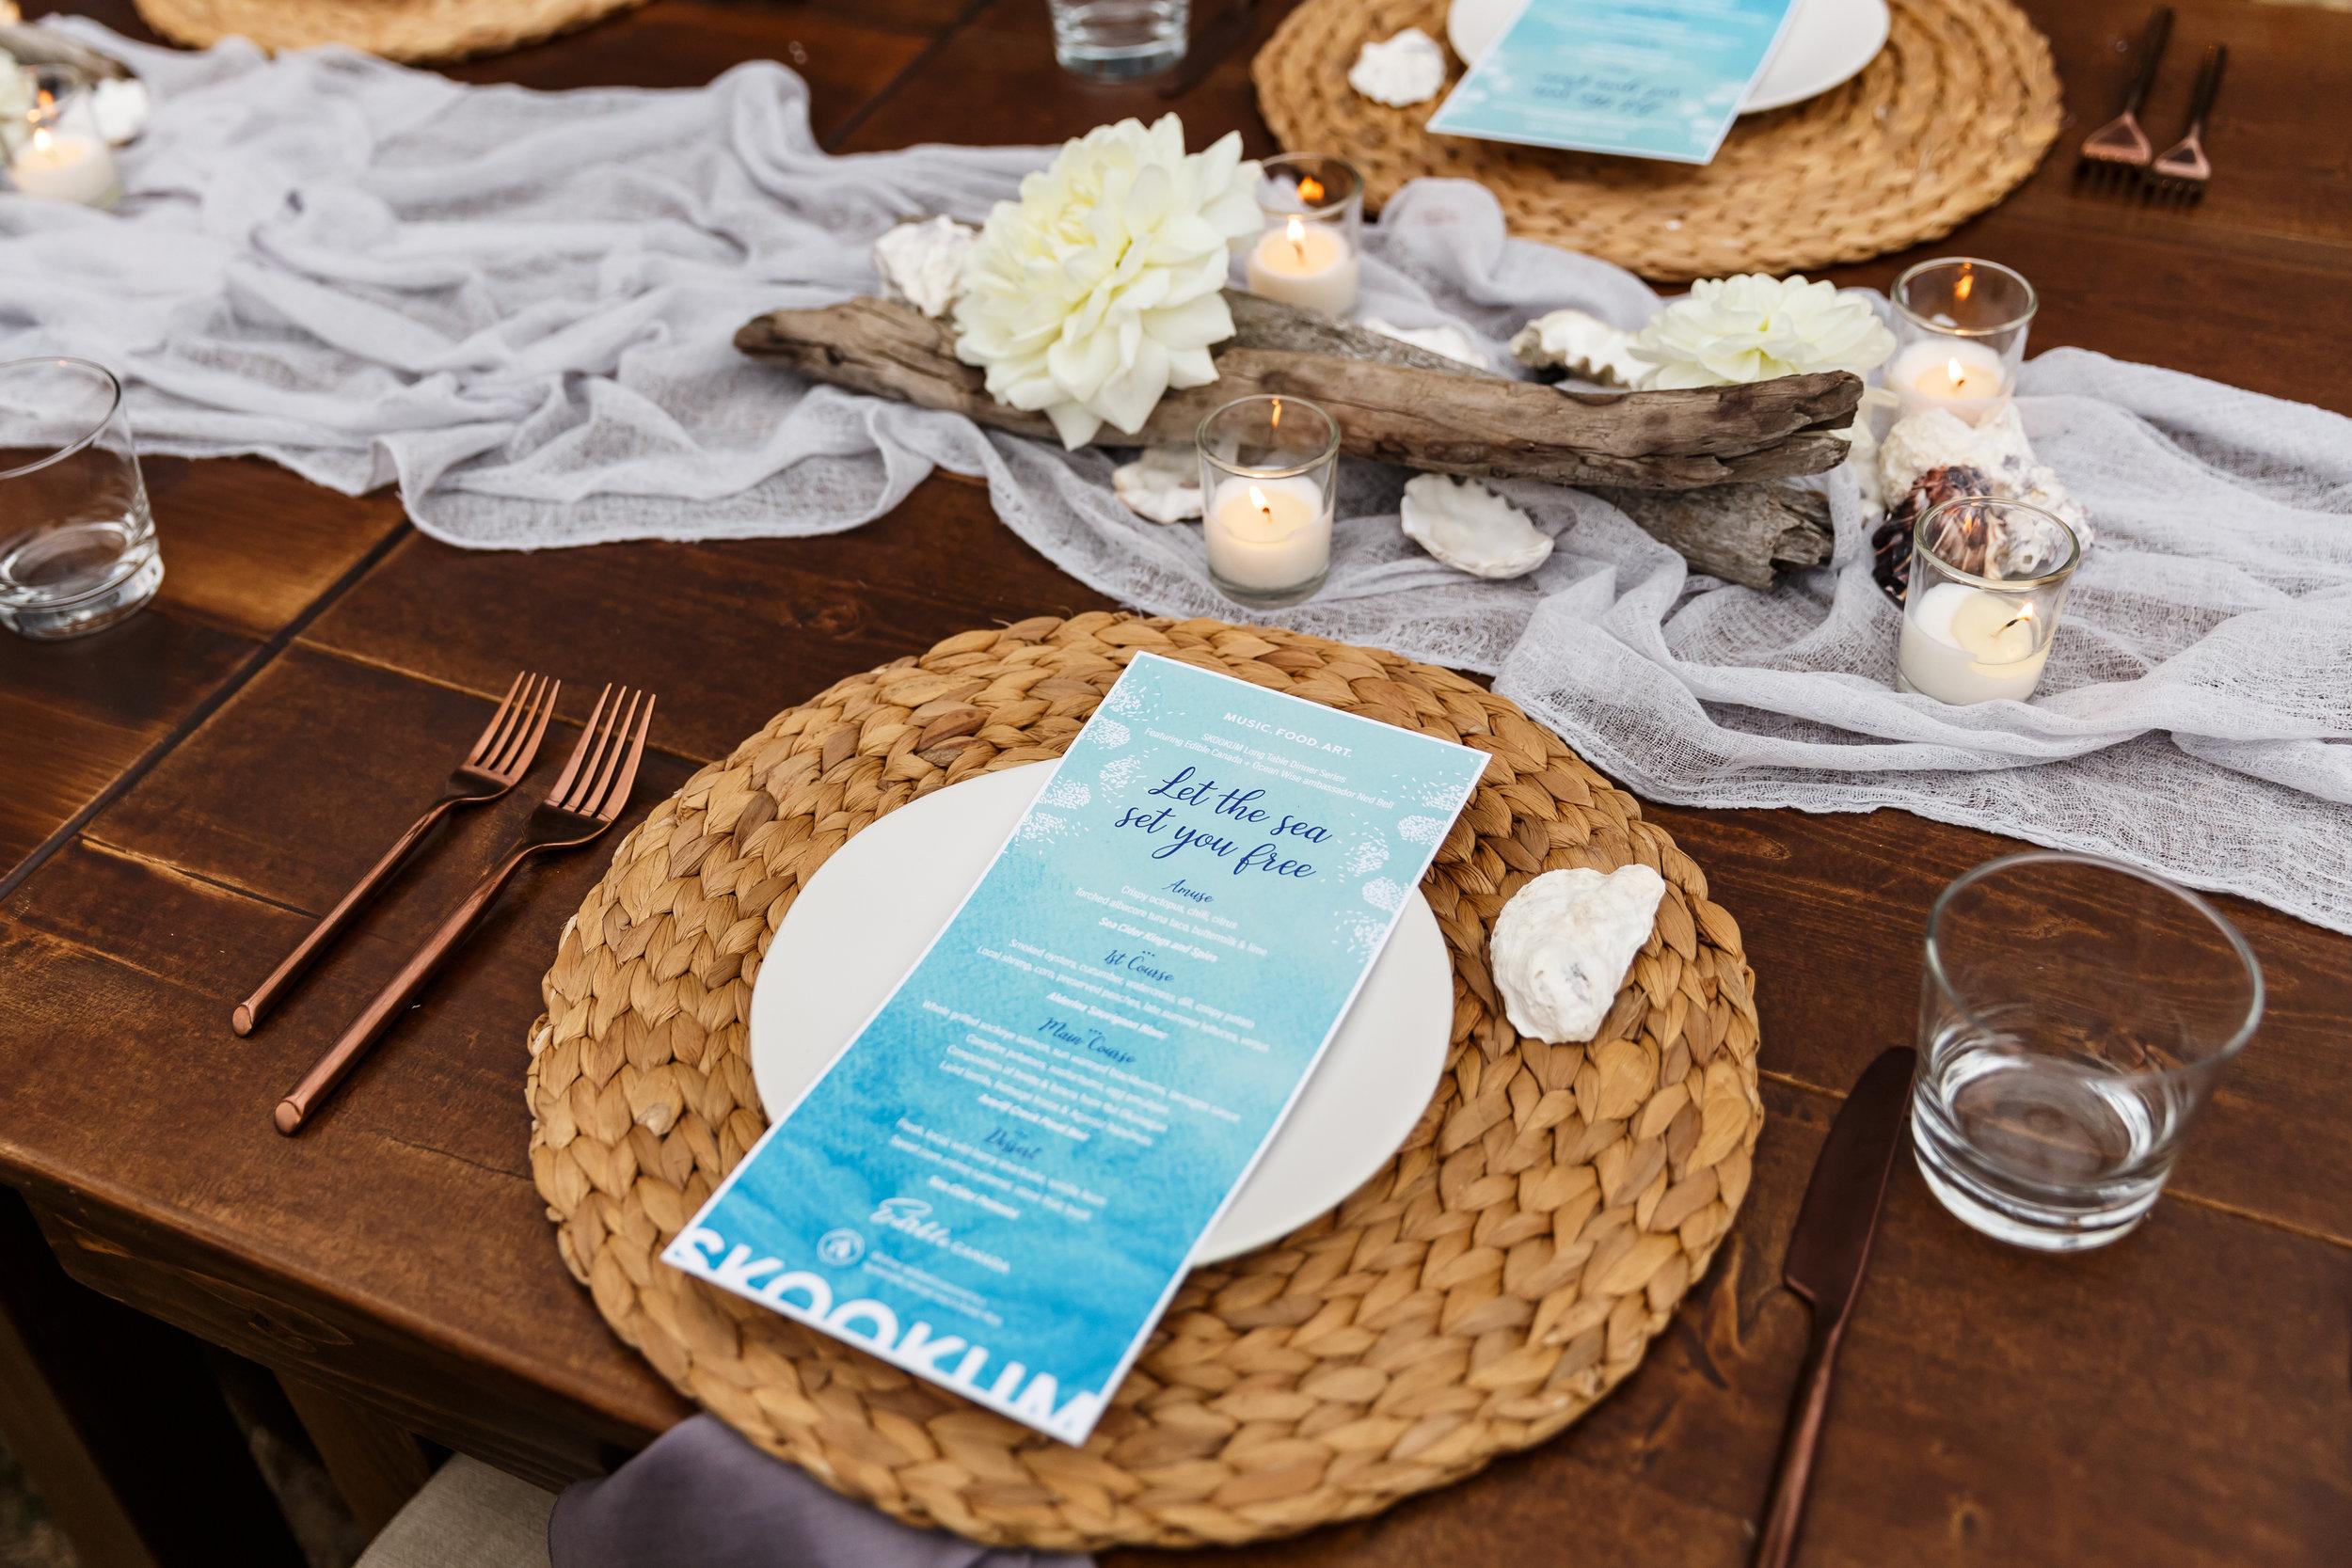 Skookum-Long-Table-Dinners-image-1.jpg